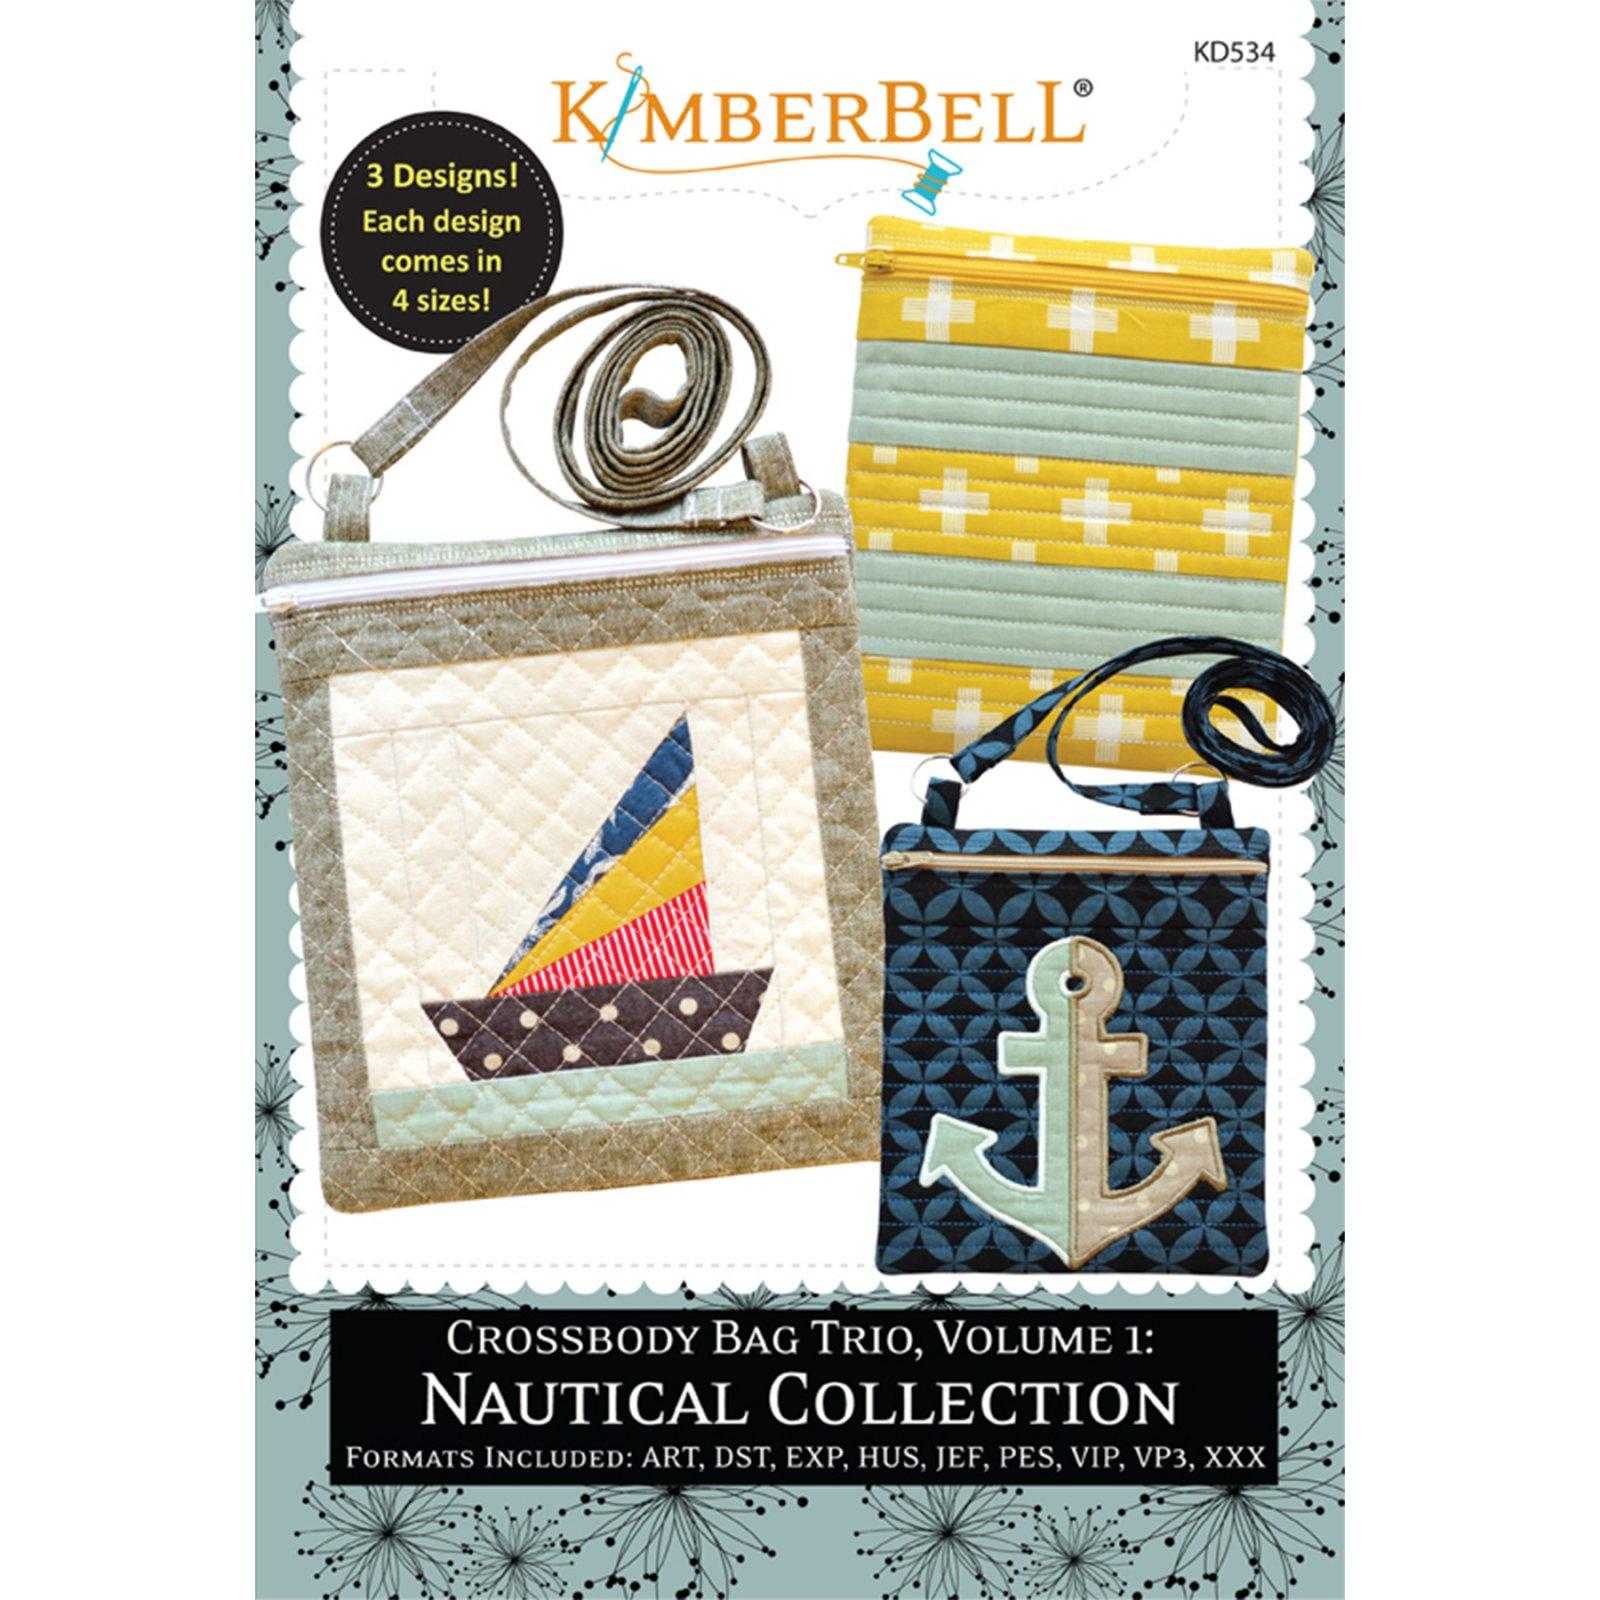 Kimberbell Crossbody Bag Trio, Vol 1: Nautical Collection